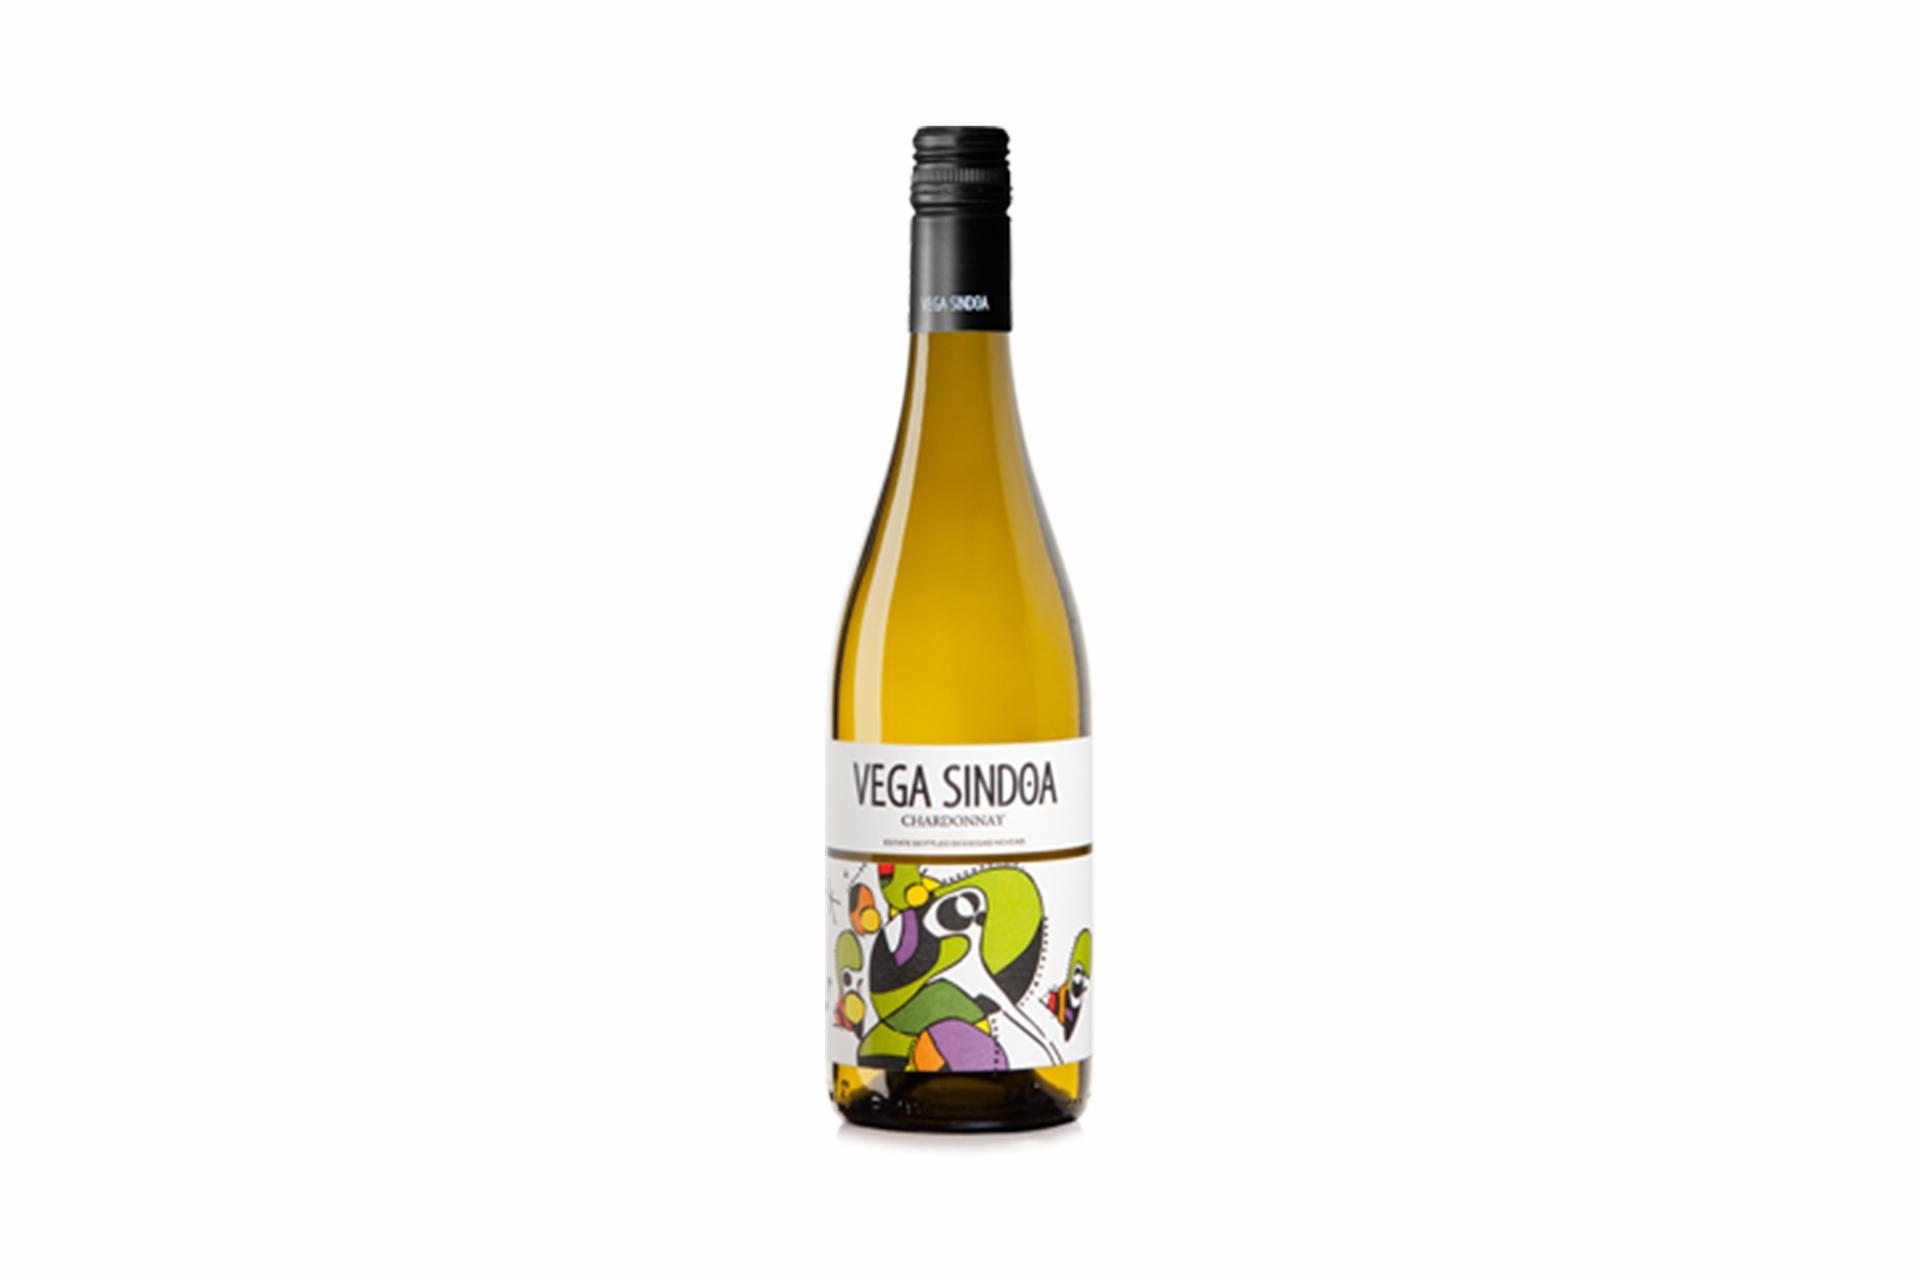 Vino Blanco 100% Chardonnay Vega Sindoa D.O. Navarra